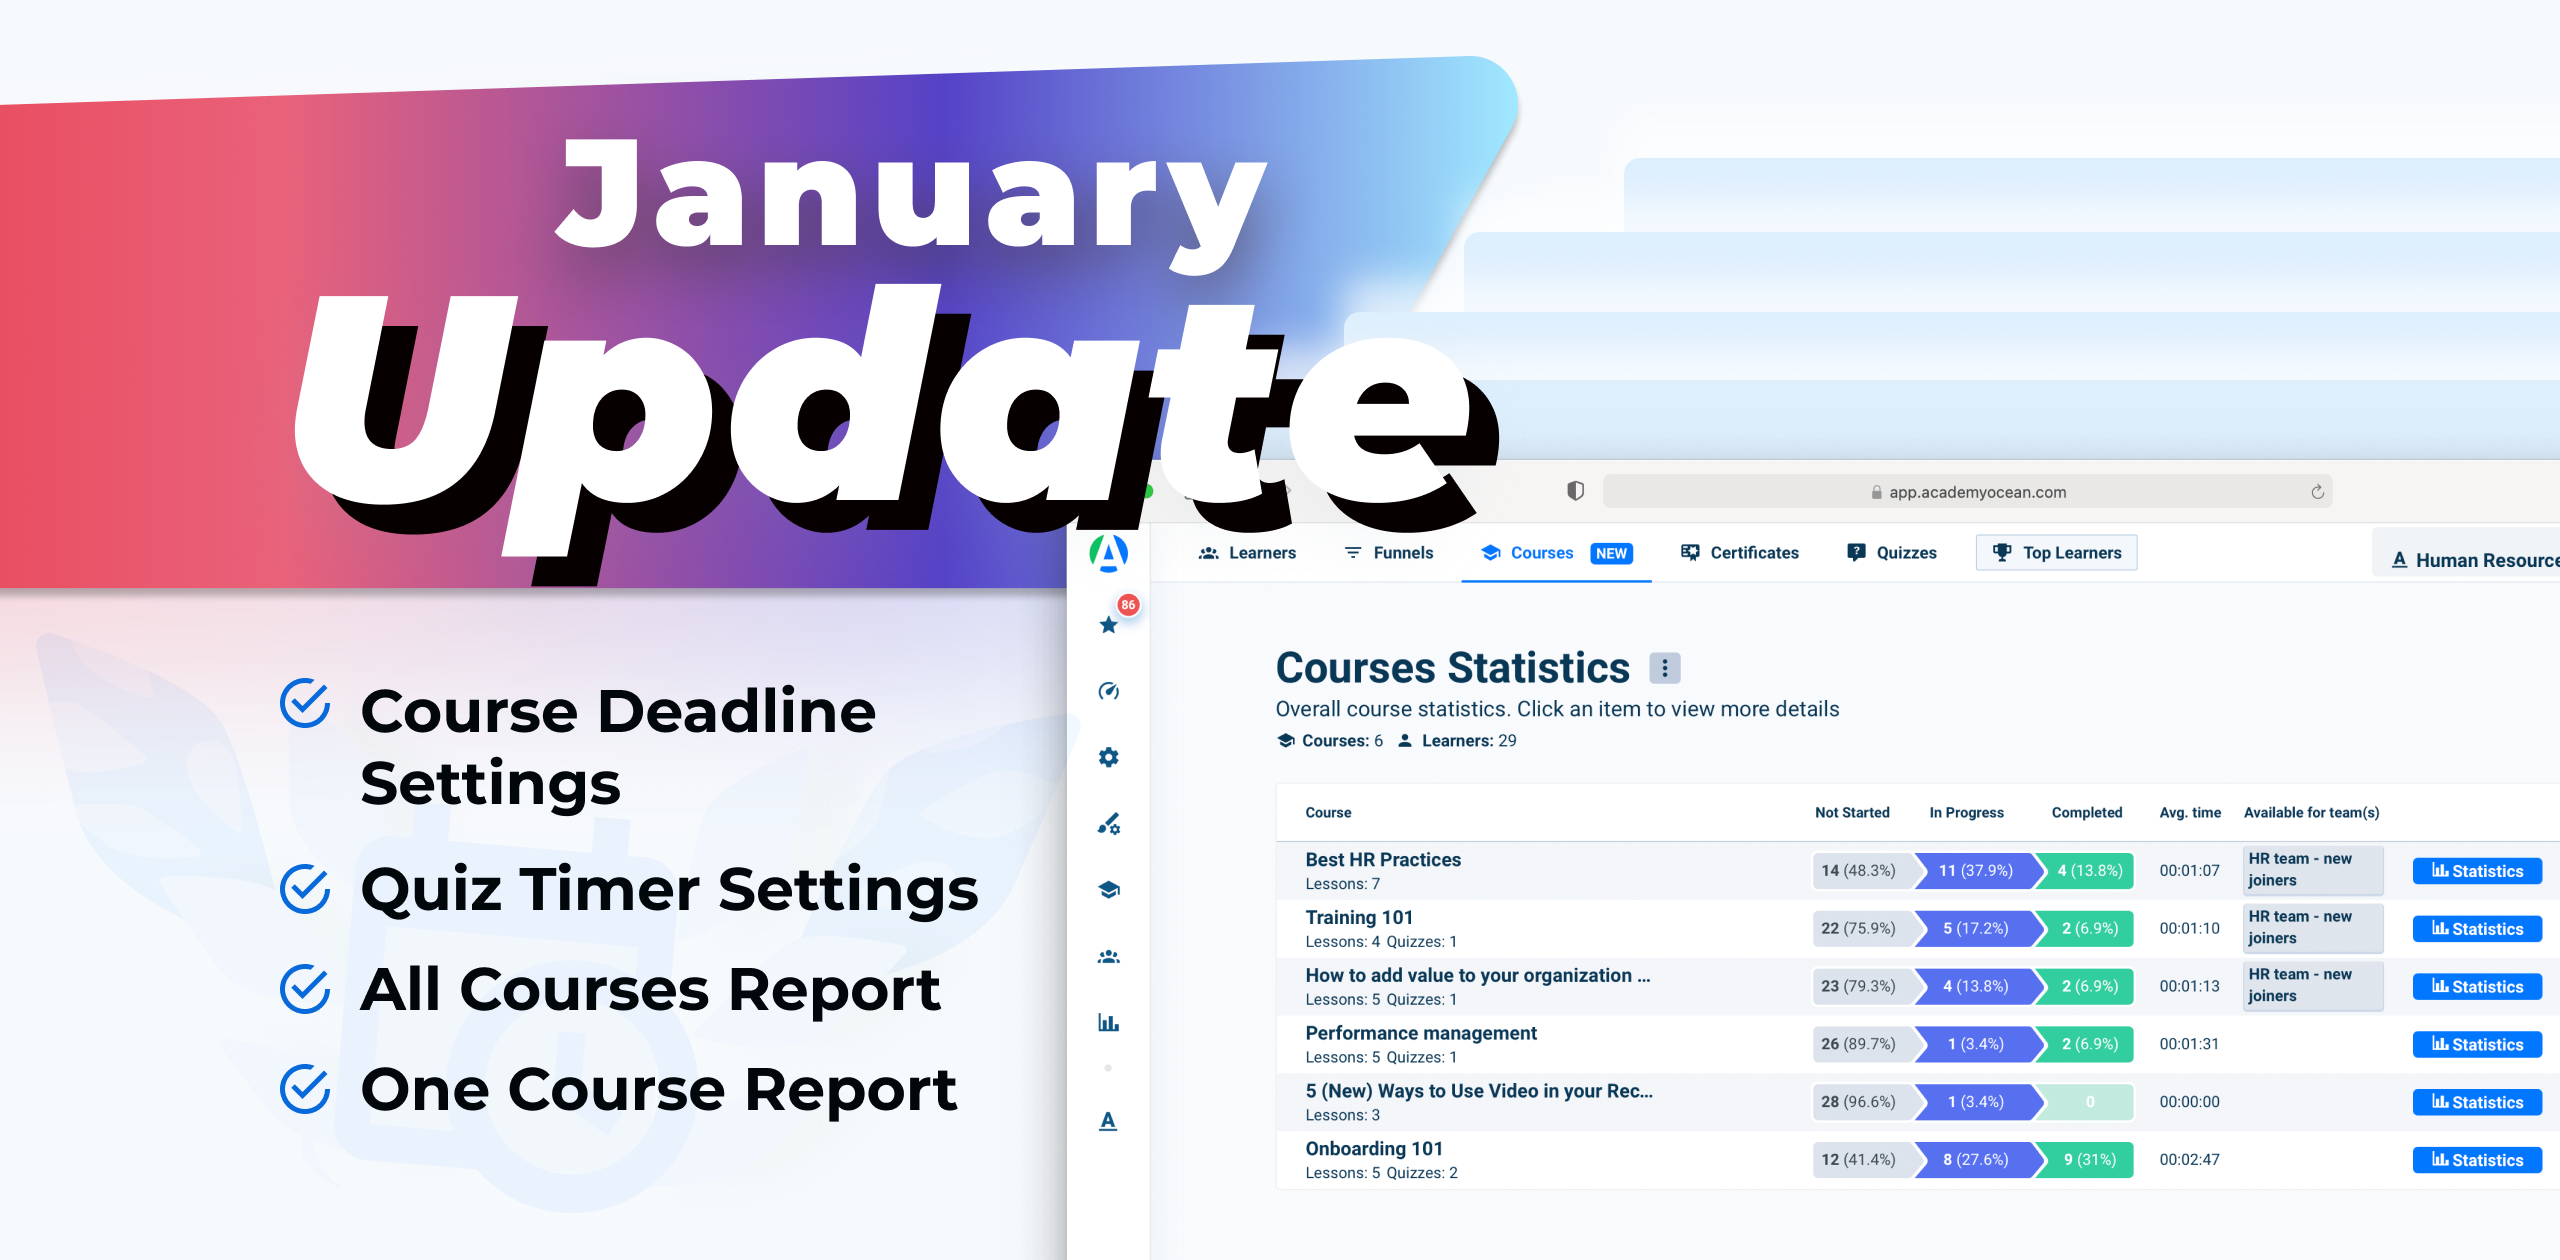 AcademyOcean January 2021 Update